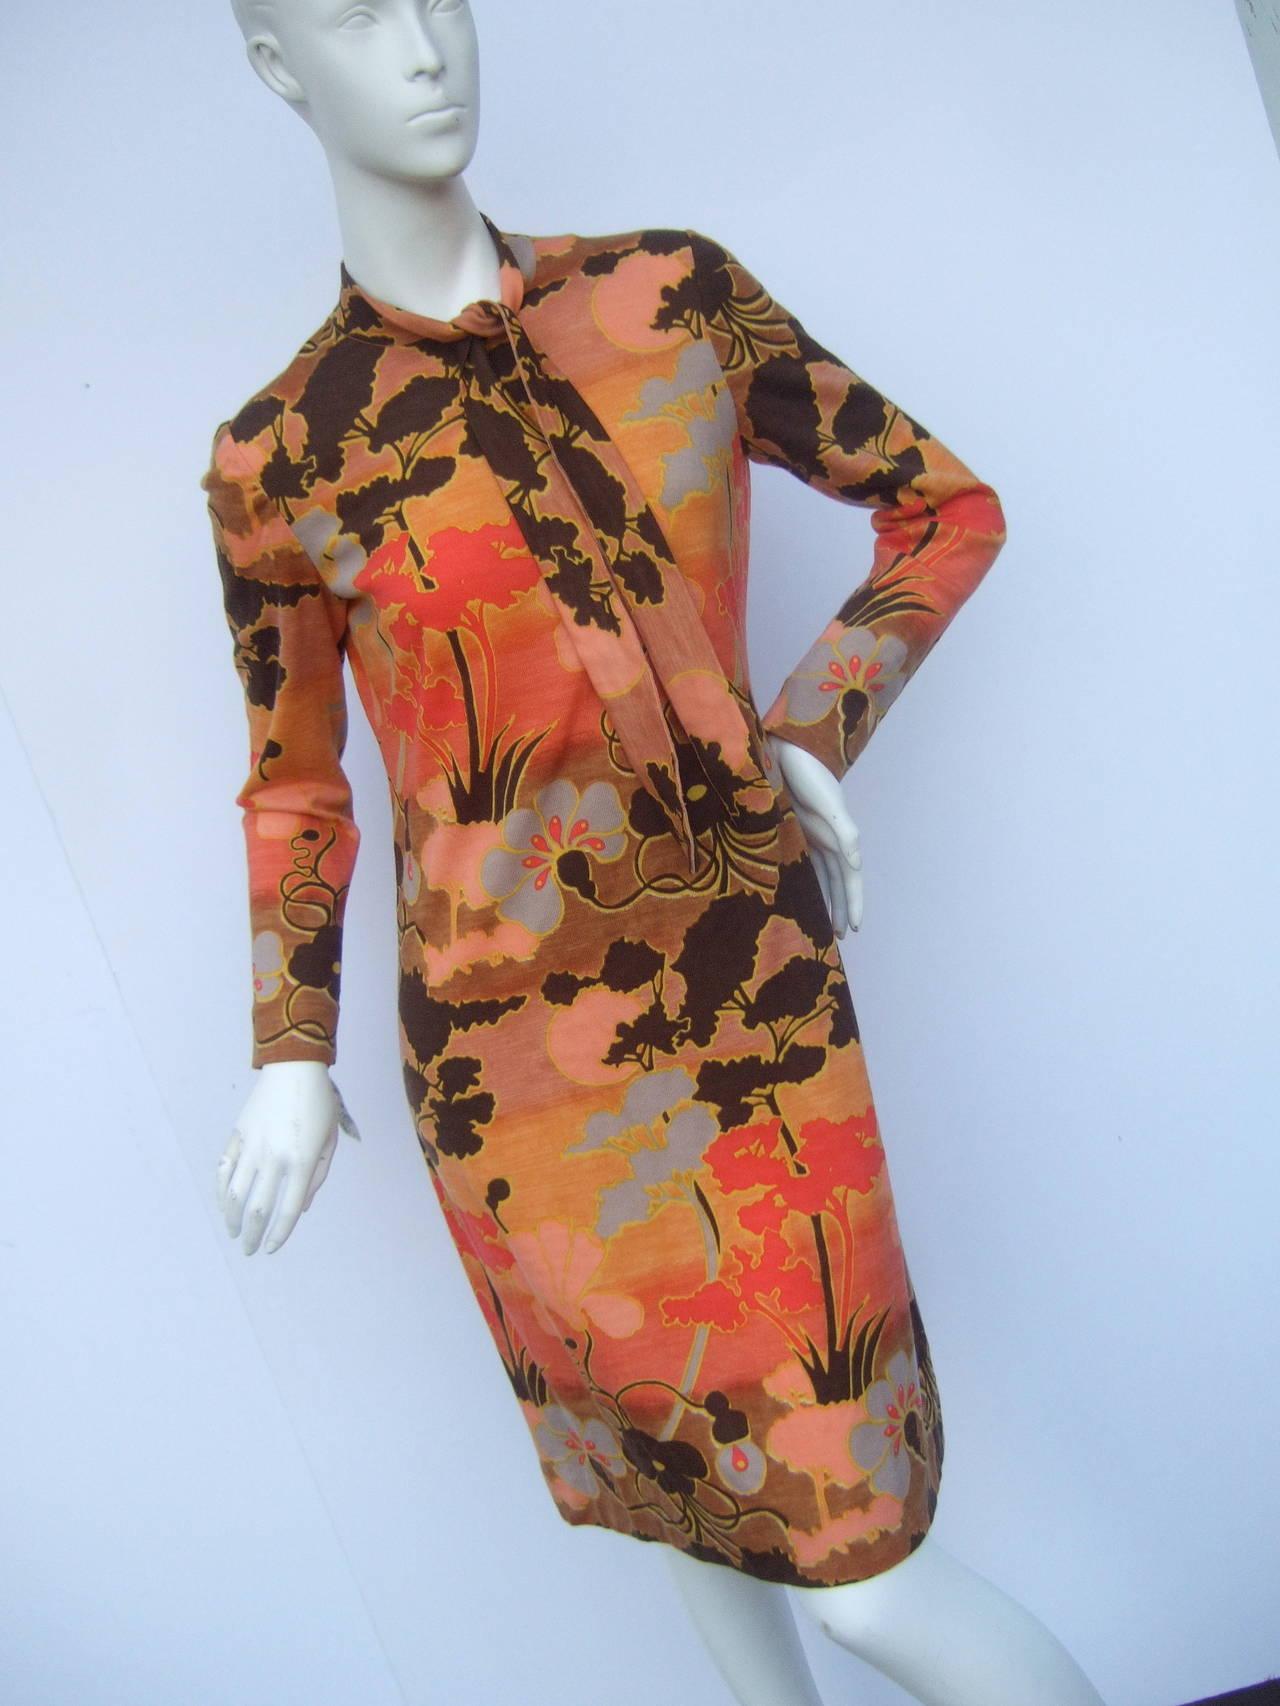 Italian Floral Print Merino Wool Knit Dress c 1970s For Sale 3